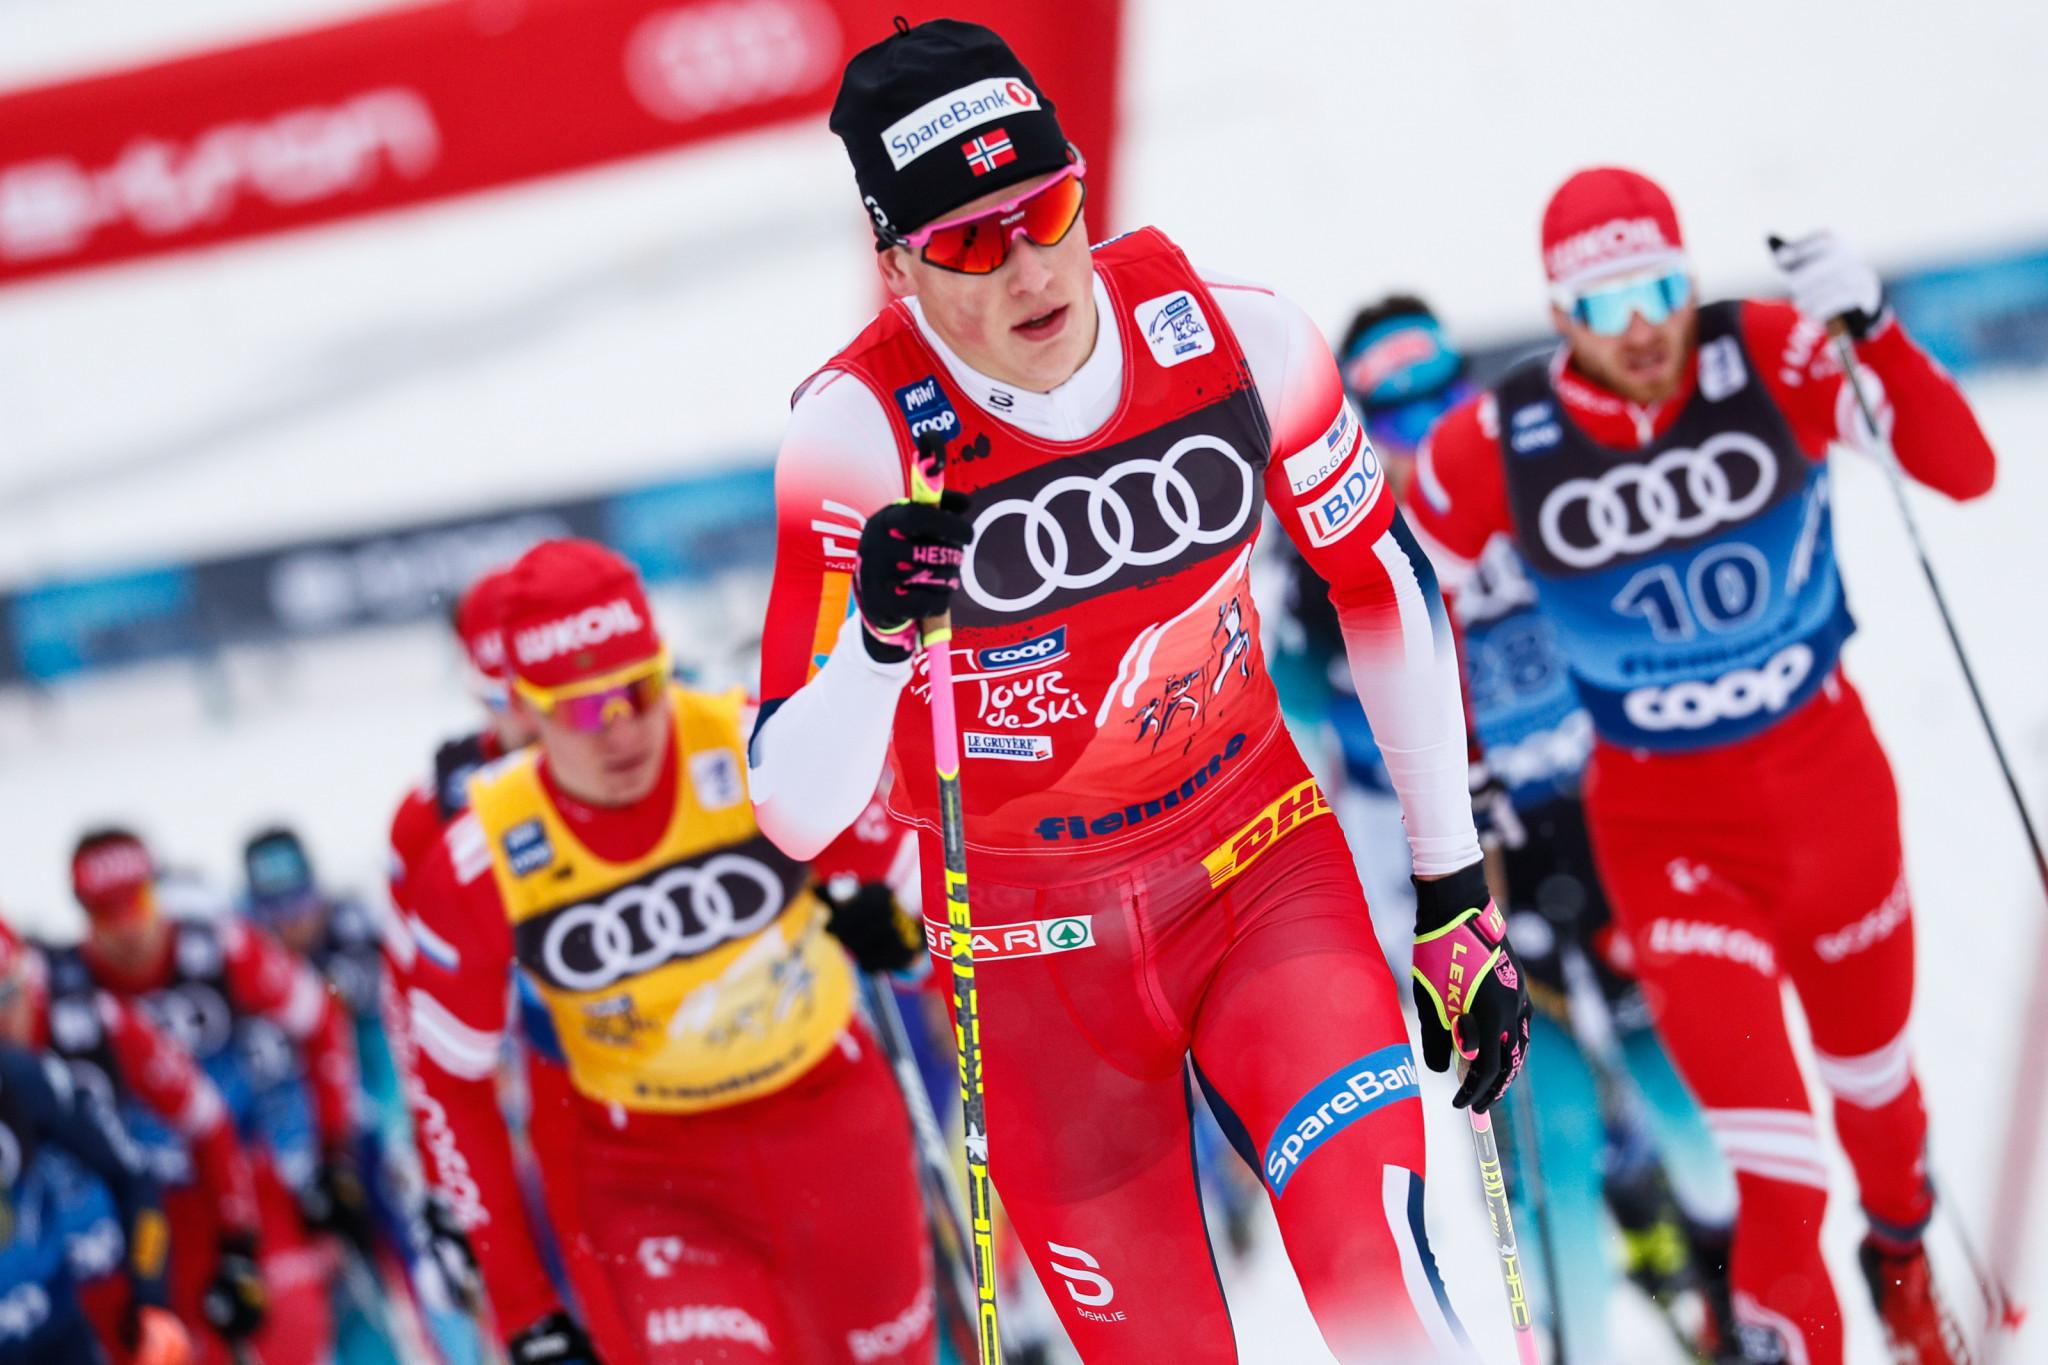 Klæbo and Jacobsen triumph at Tour de Ski grand final in Val di Fiemme